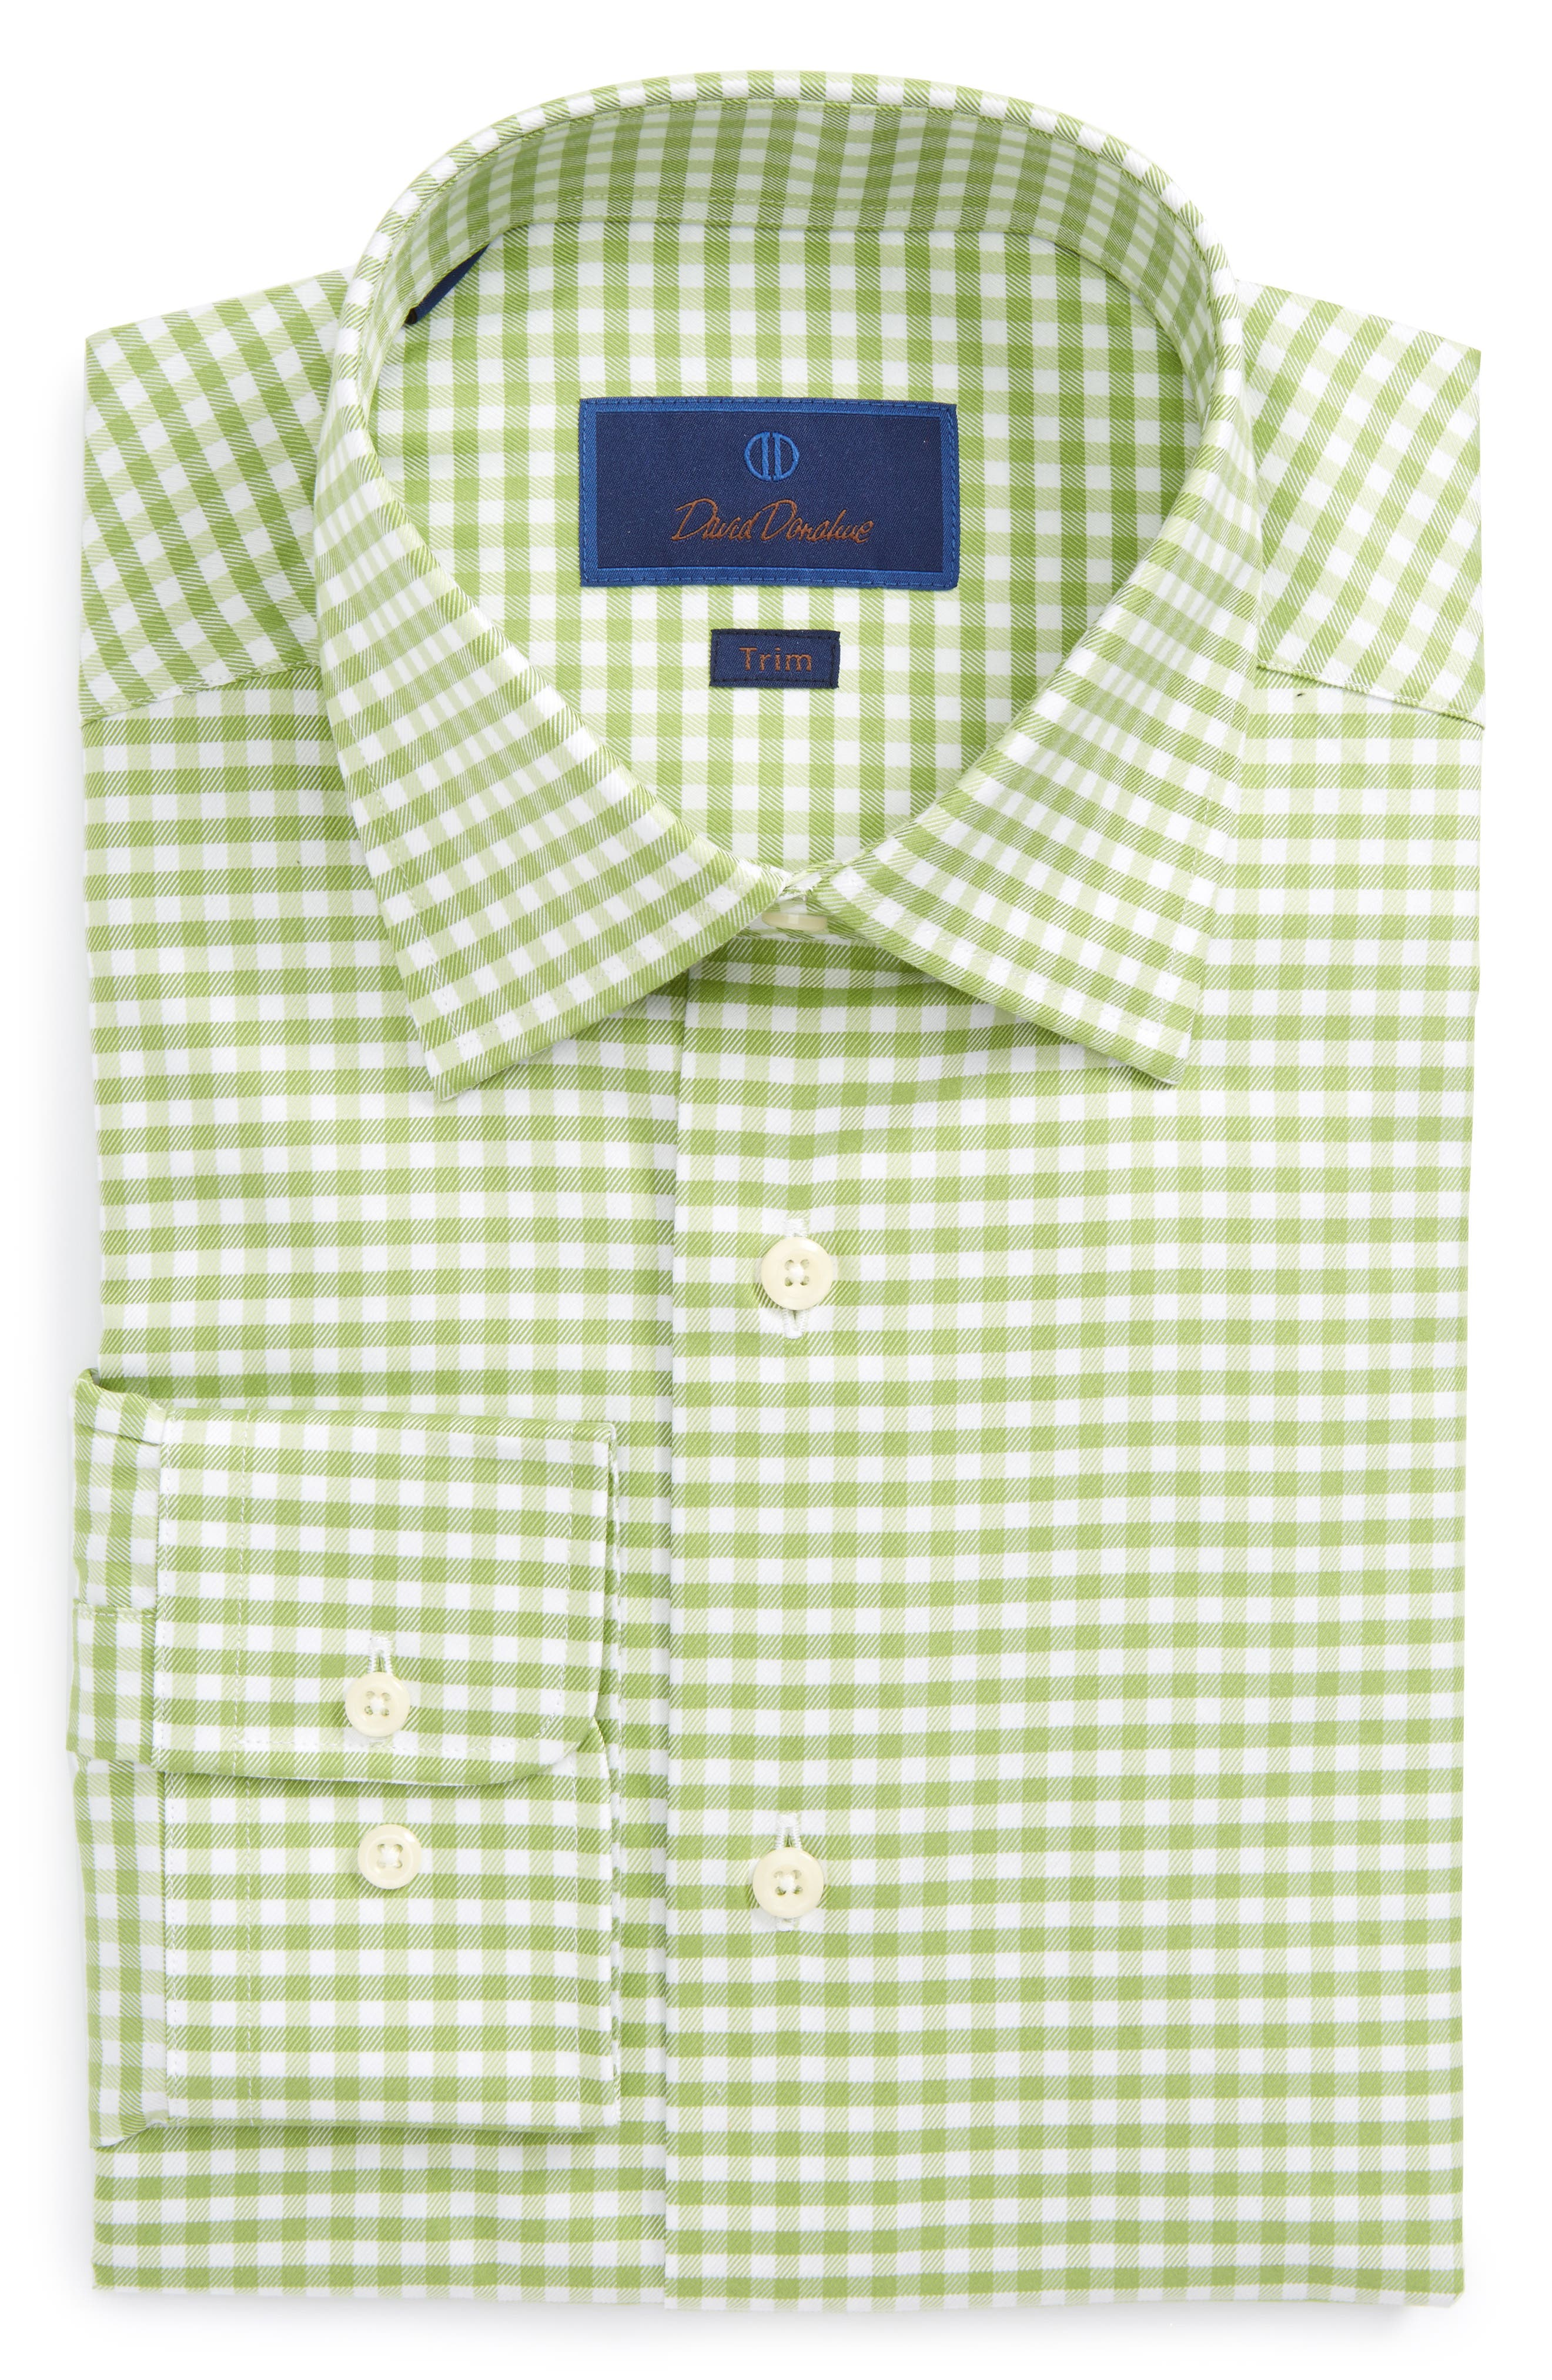 David Donahue Trim Fit Gingham Dress Shirt